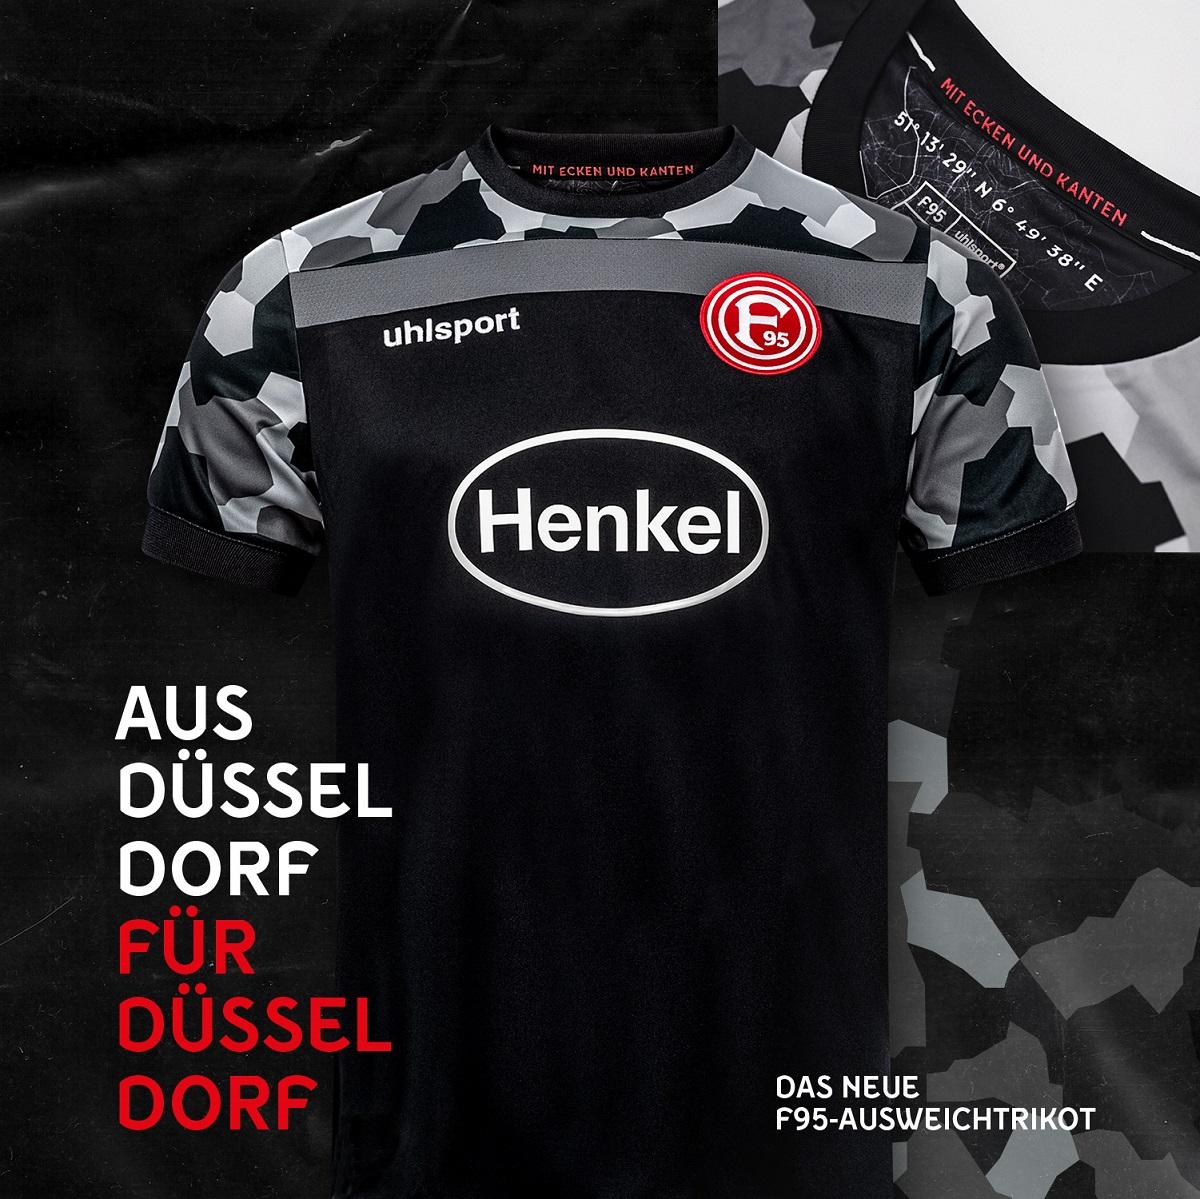 Camisas do Fortuna Düsseldorf 2020-2021 Uhlsport